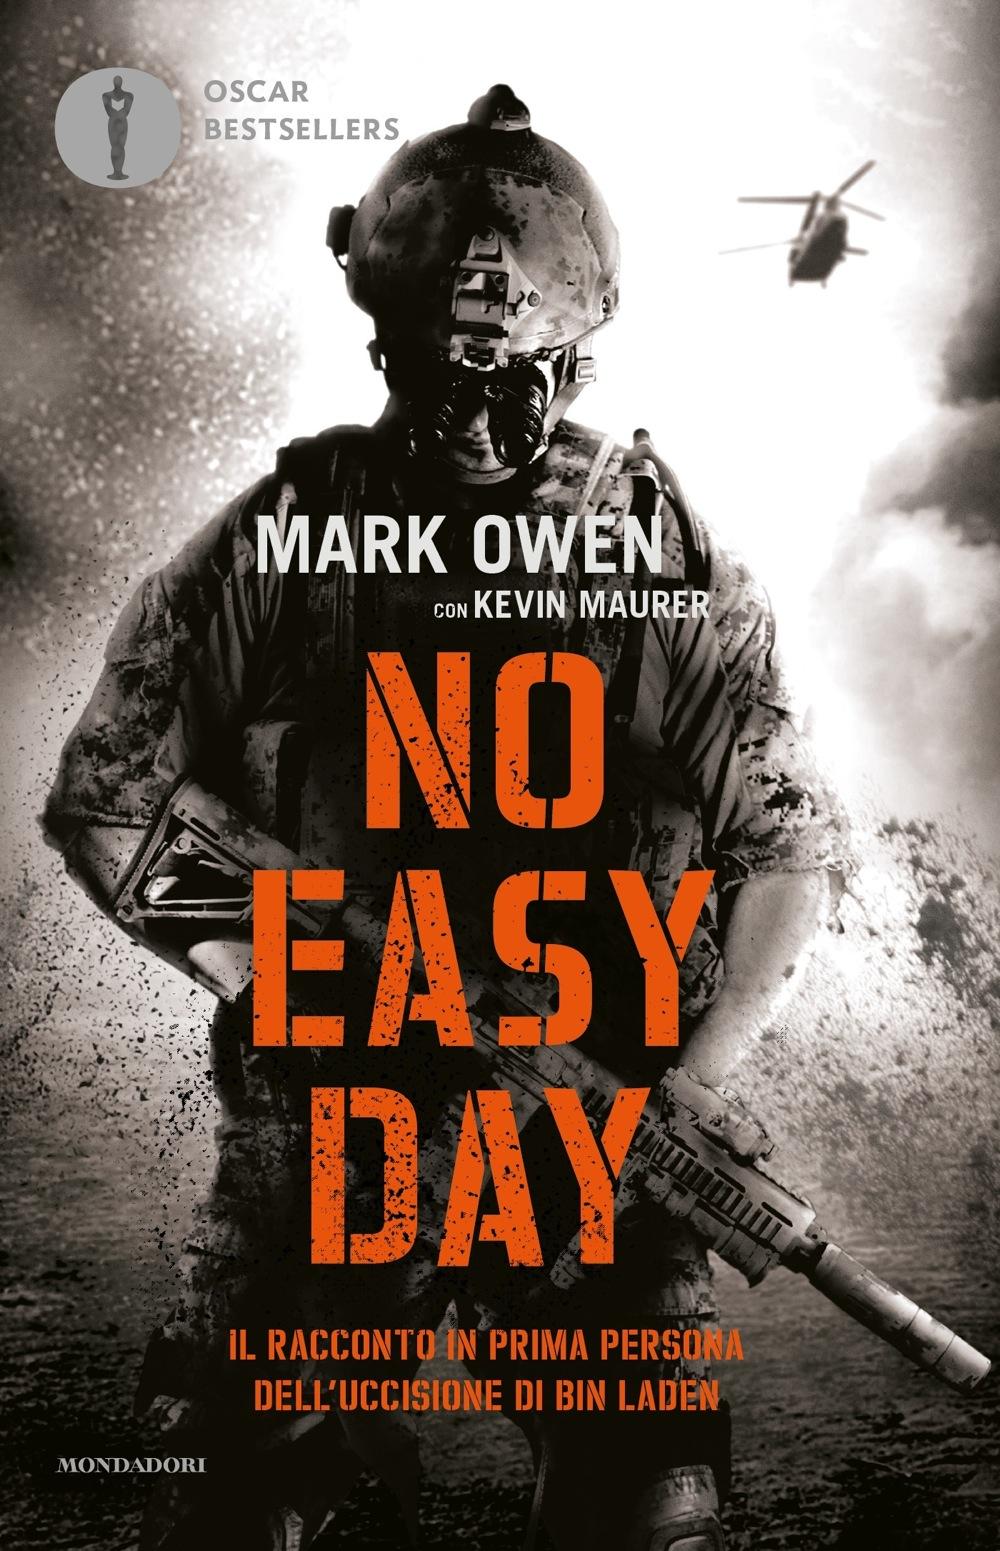 No easy day - Mark Owen, Kevin Maurer | Libri Mondadori